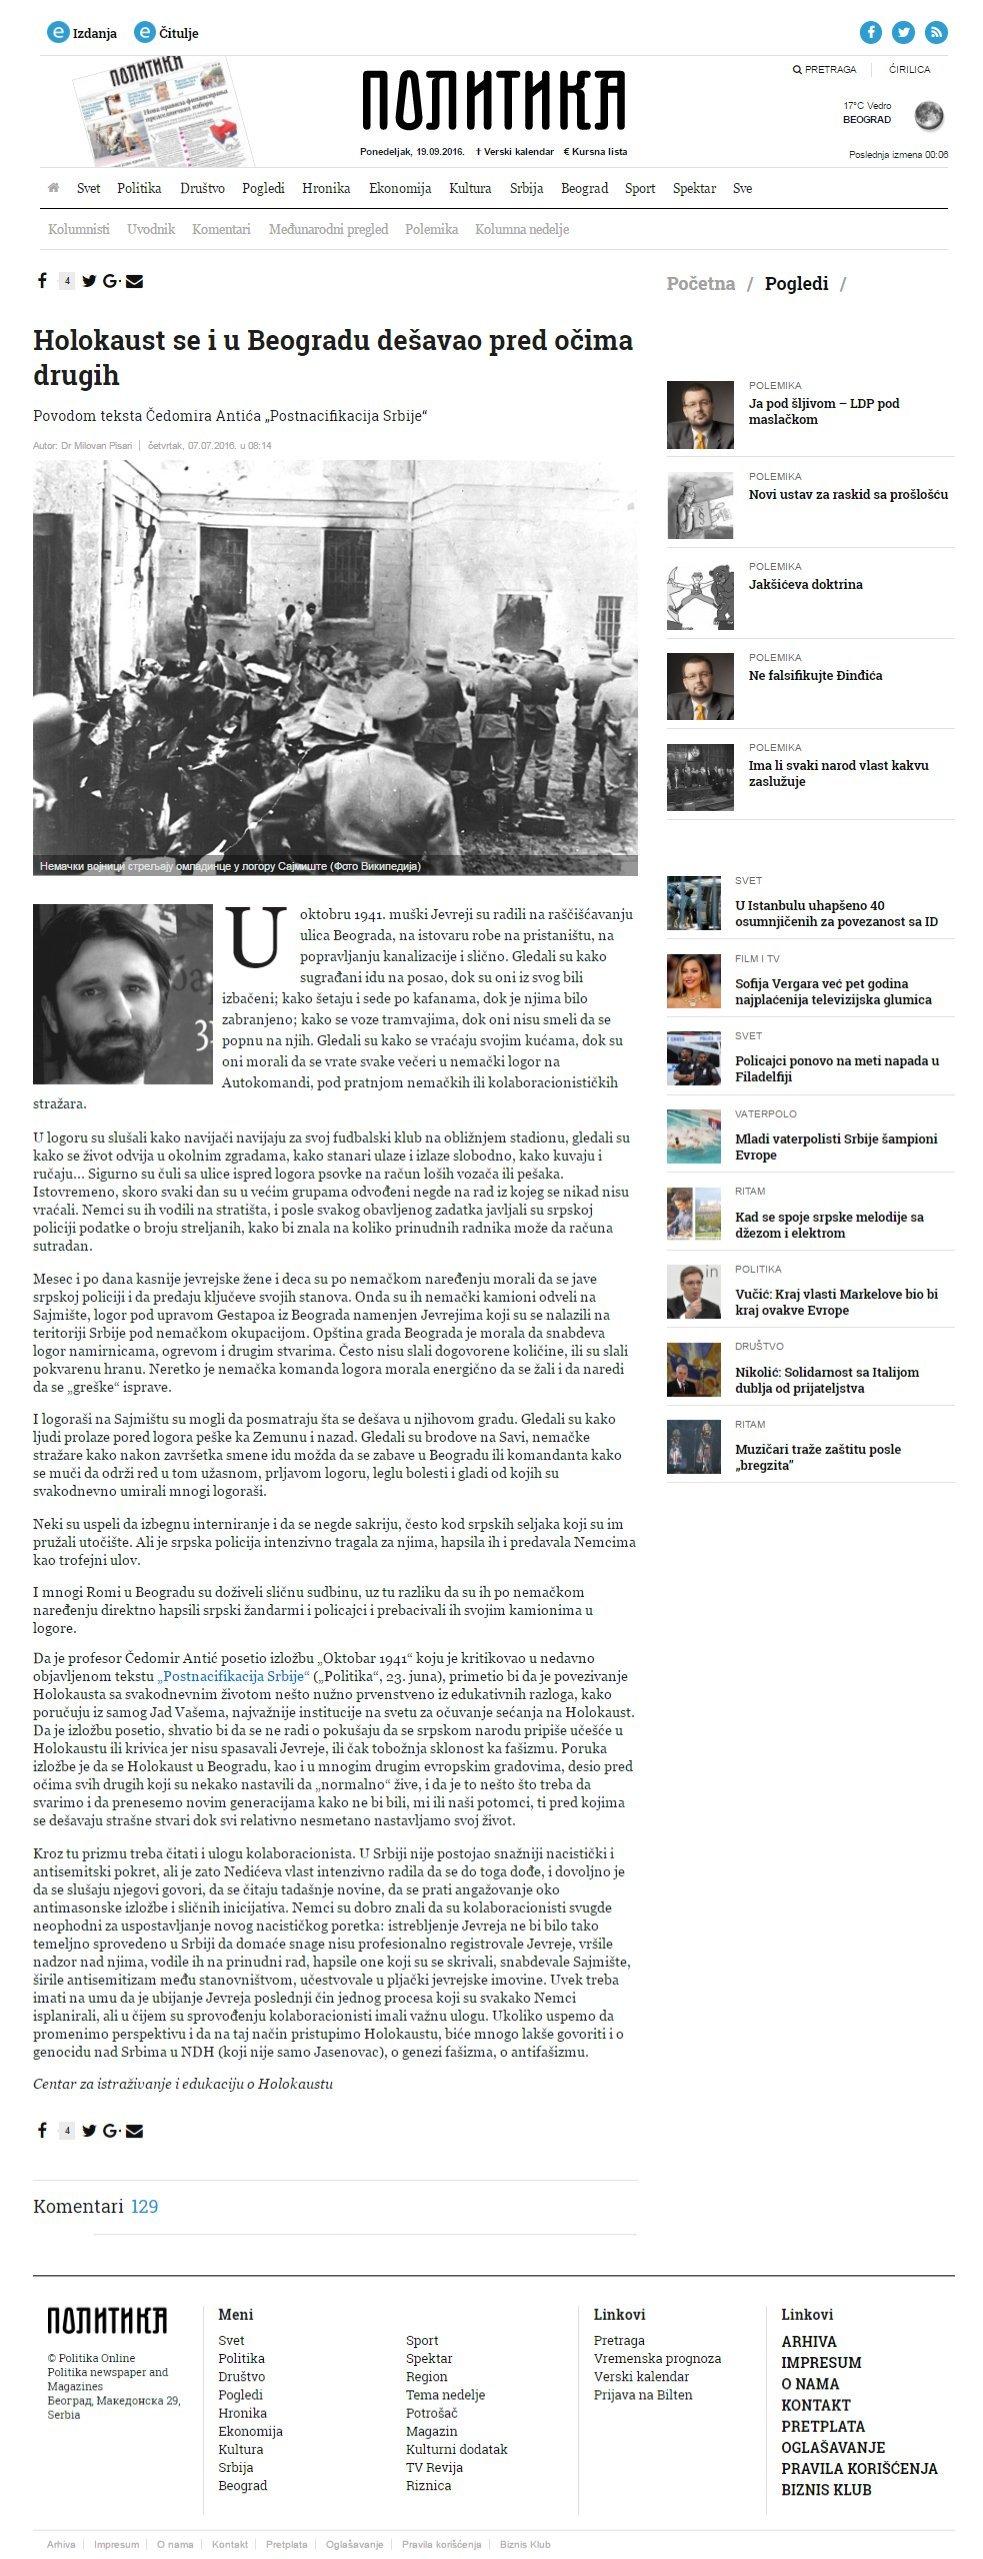 press_clipping_20160707-politika